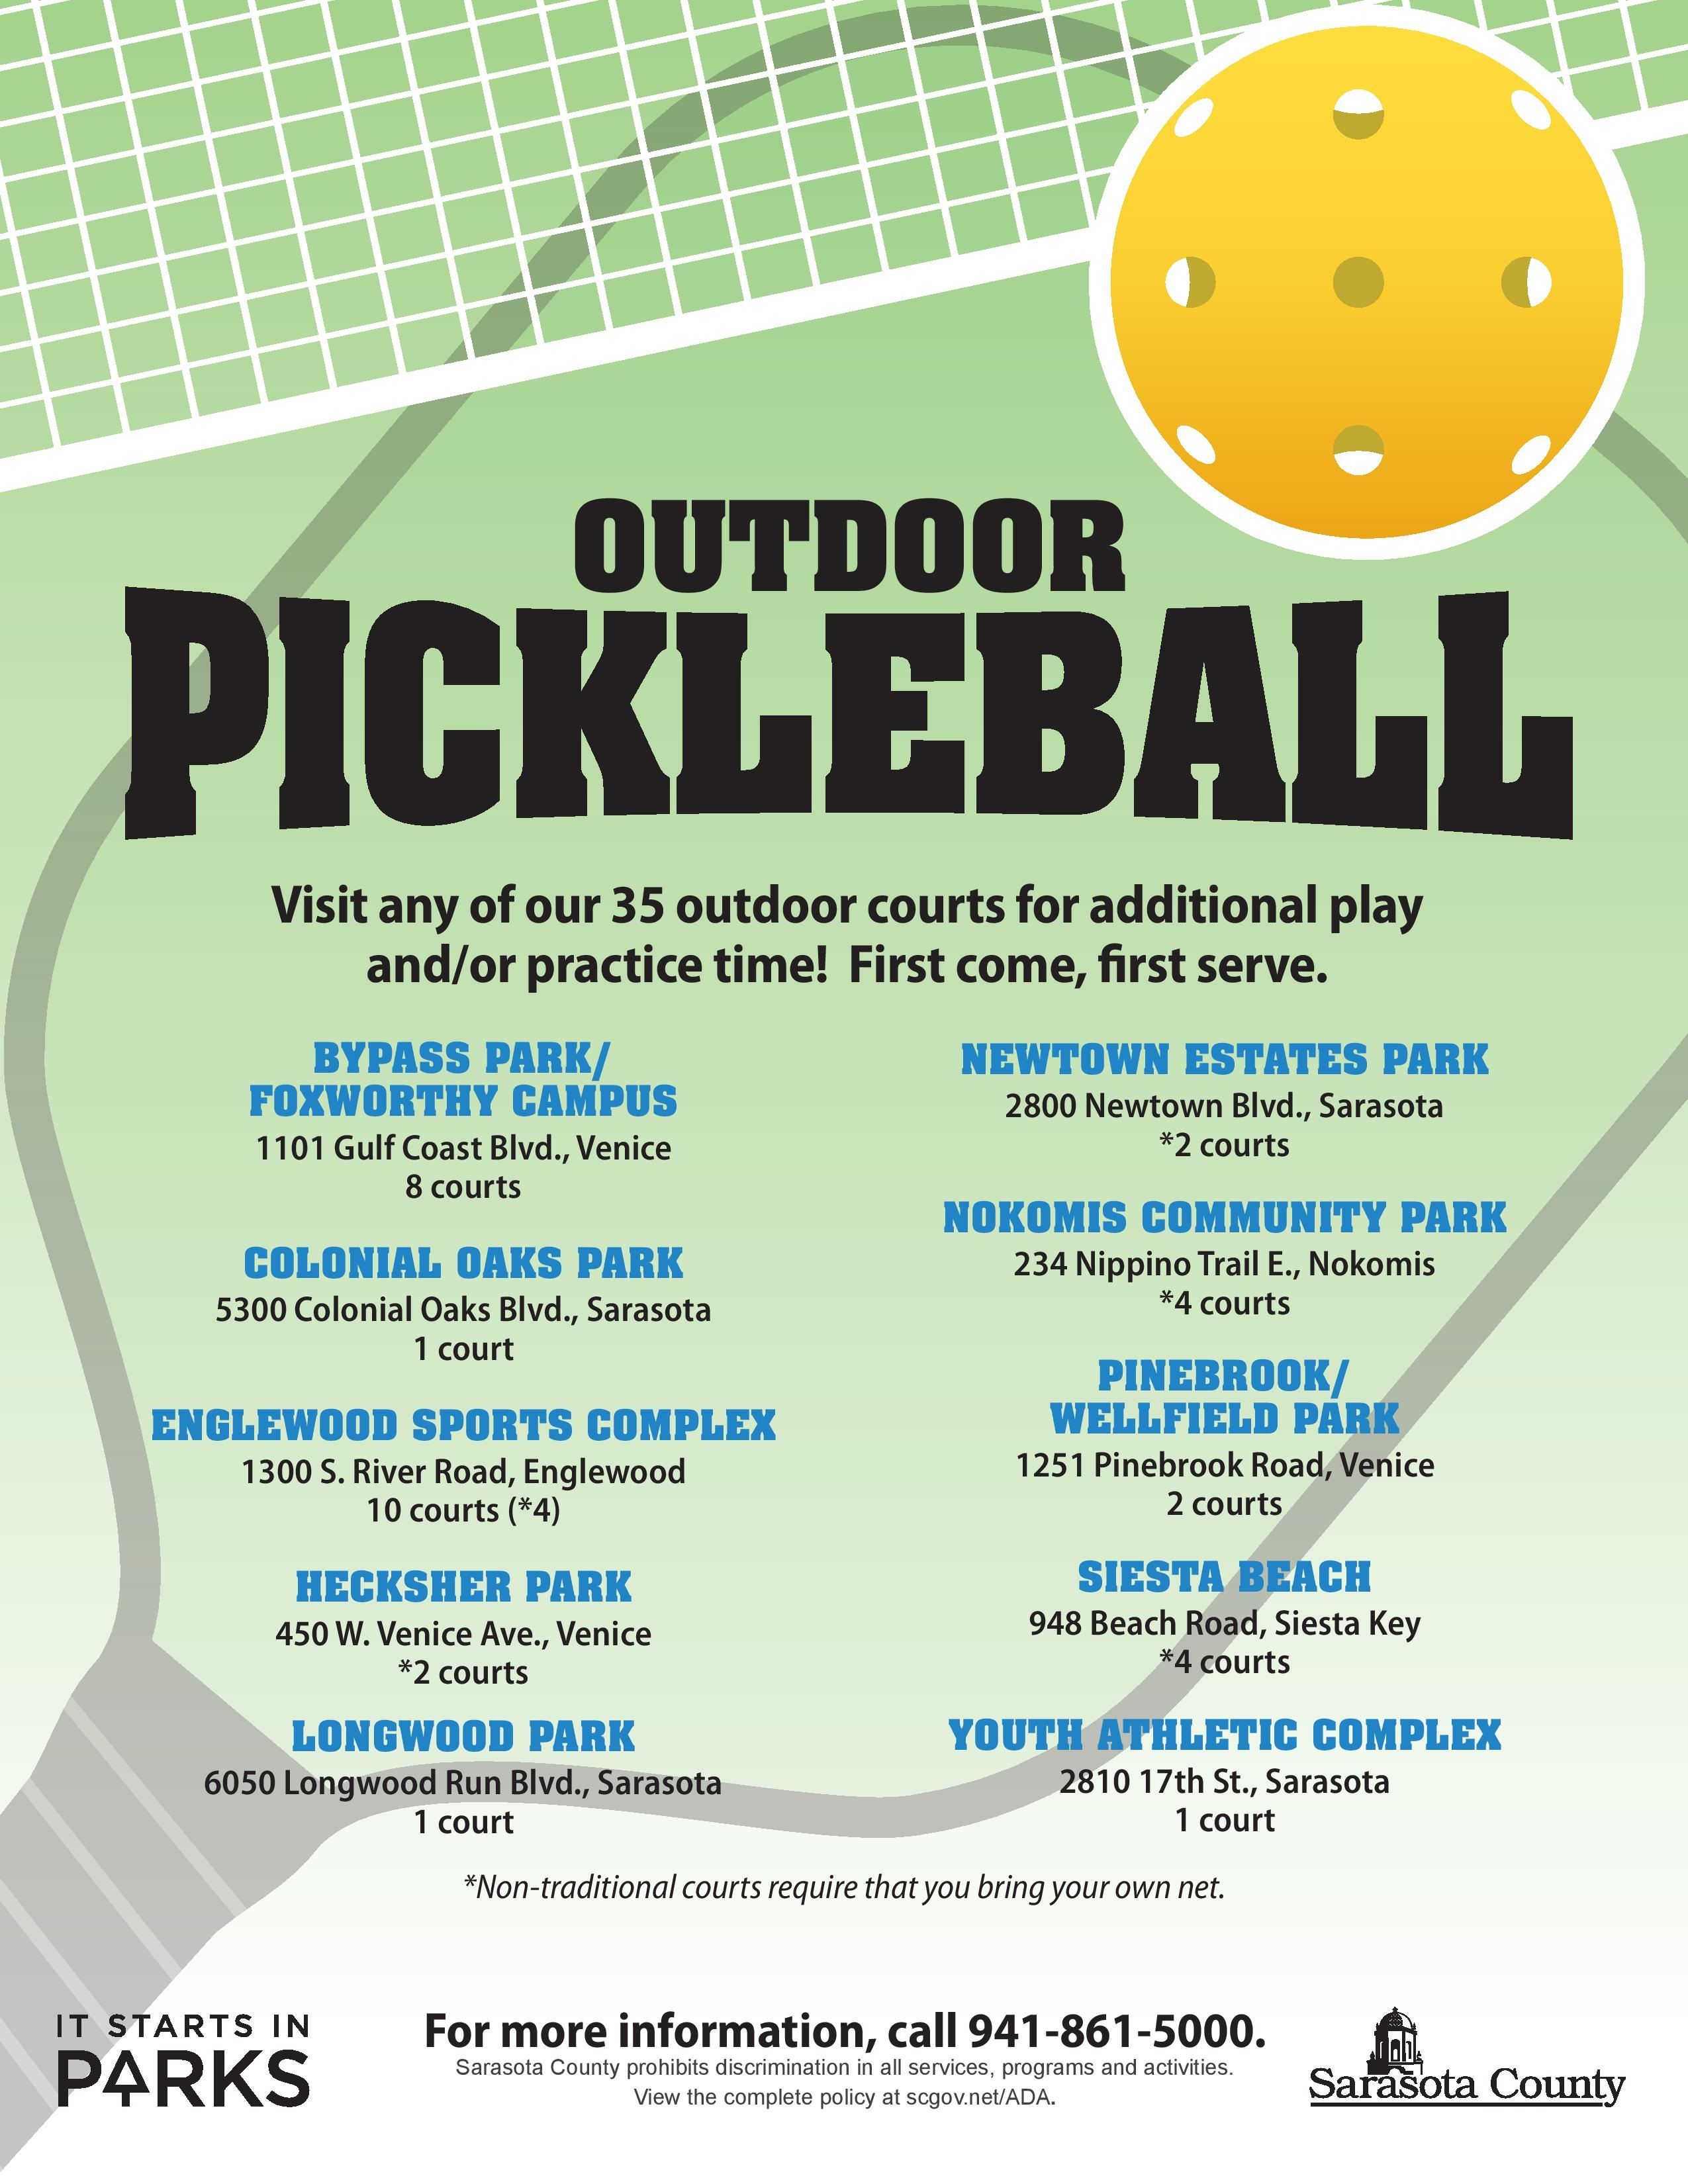 sarasota pickleball  u2013 for pickleball players of all skill